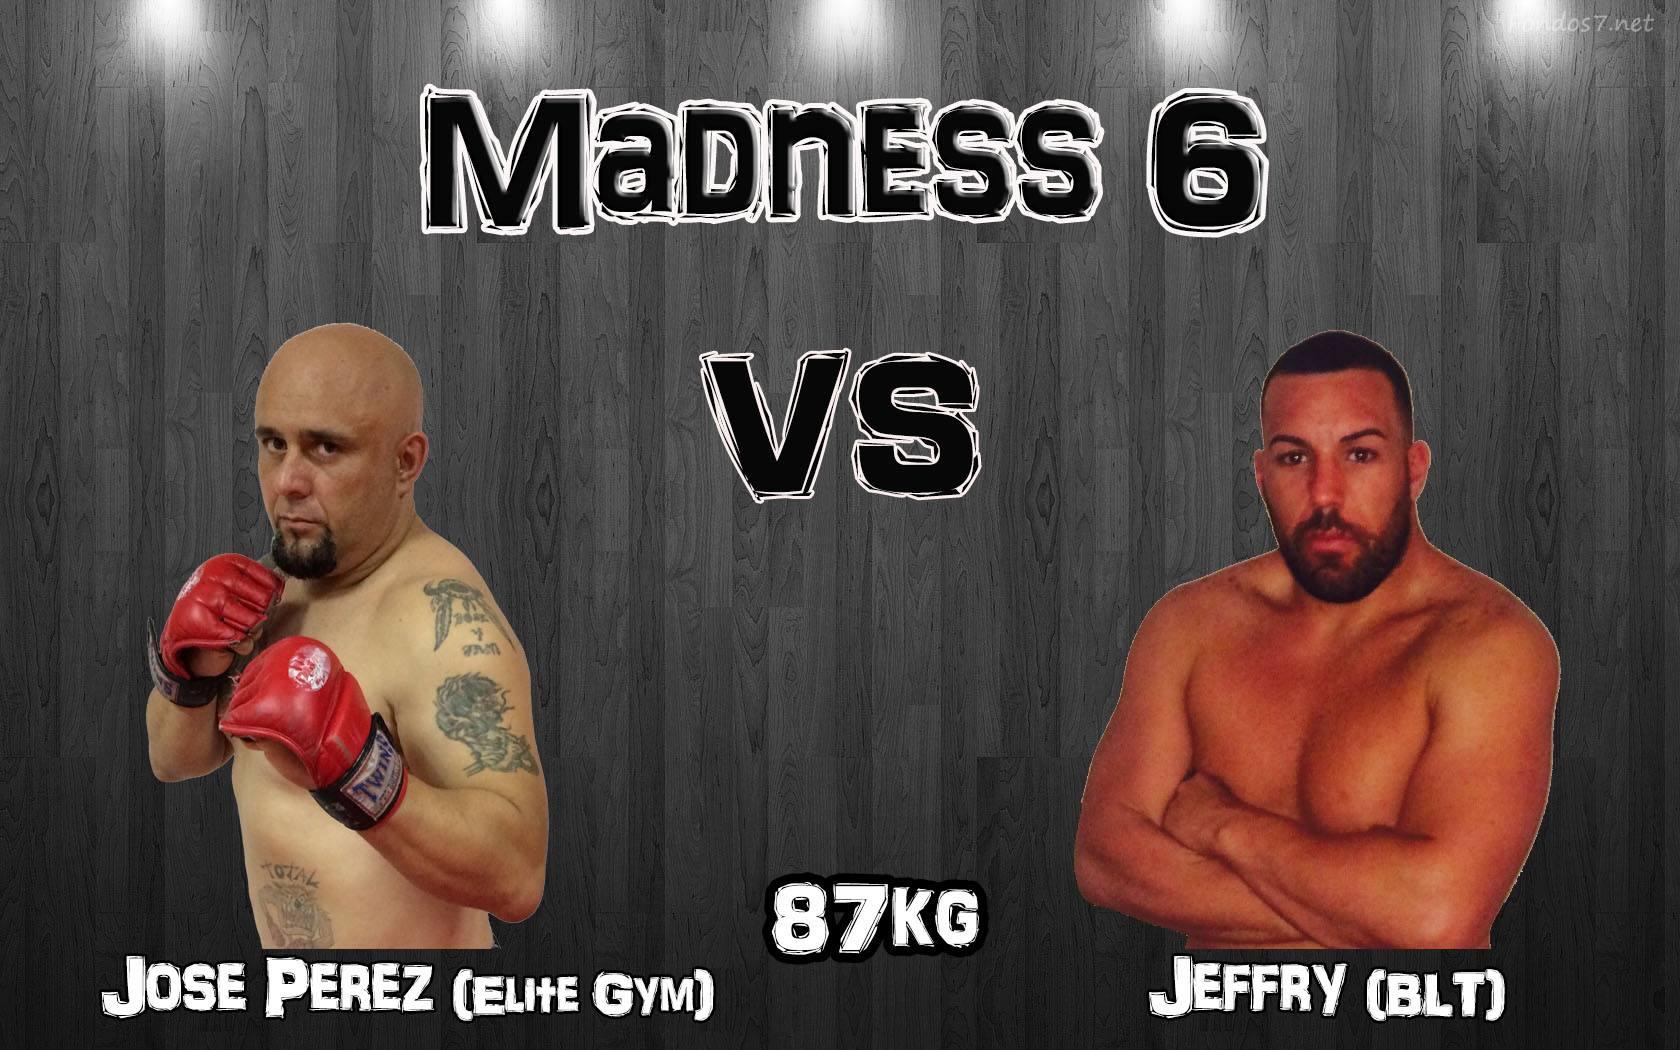 Jose Perez (Elite Gym) vs Jeffry (BLT) 87kg